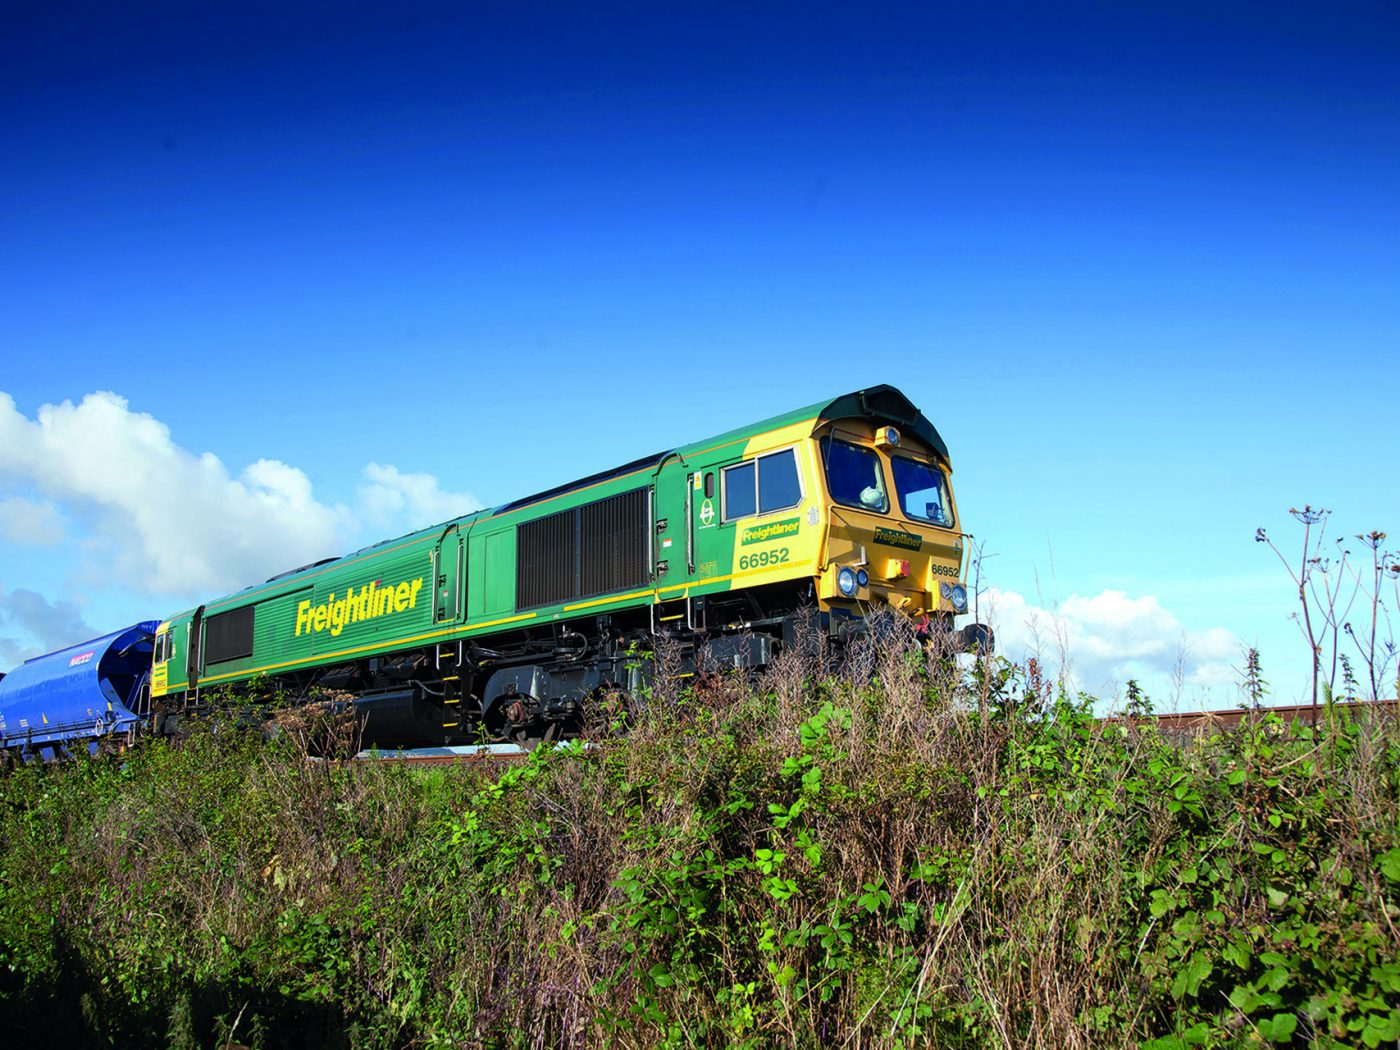 Freightliner locomotive